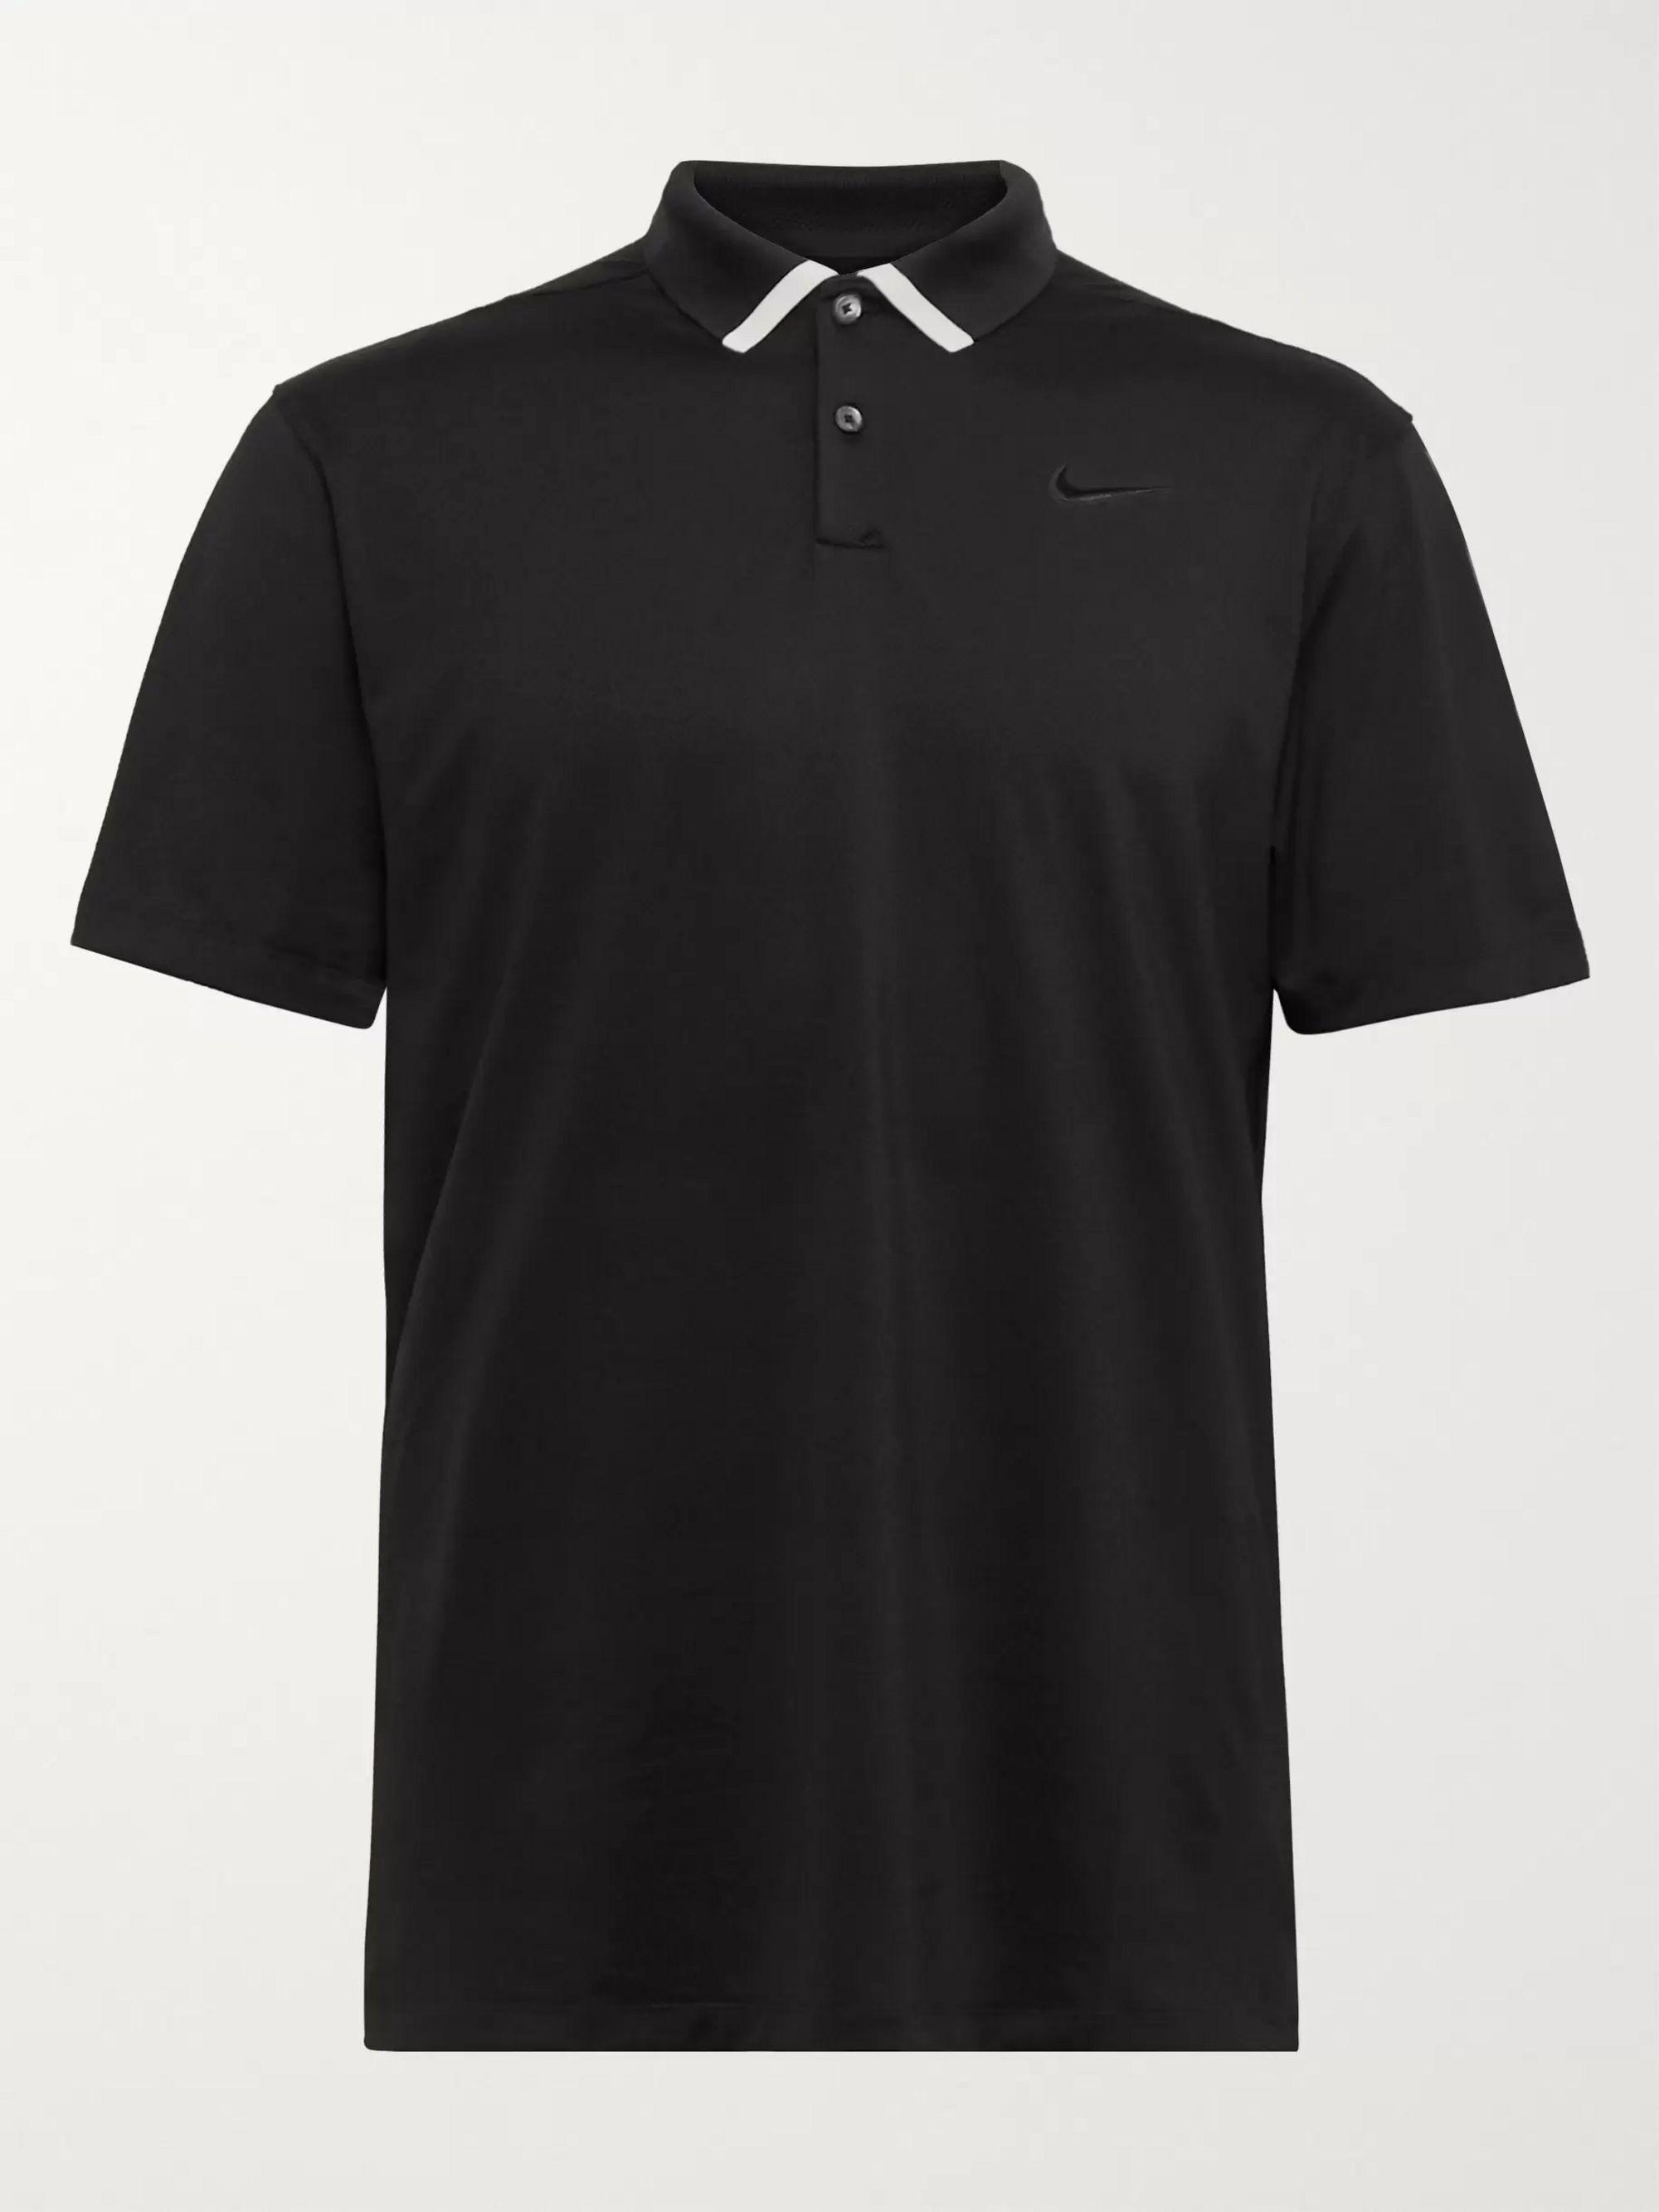 Nike Golf Vapor Dri-FIT Golf Polo Shirt